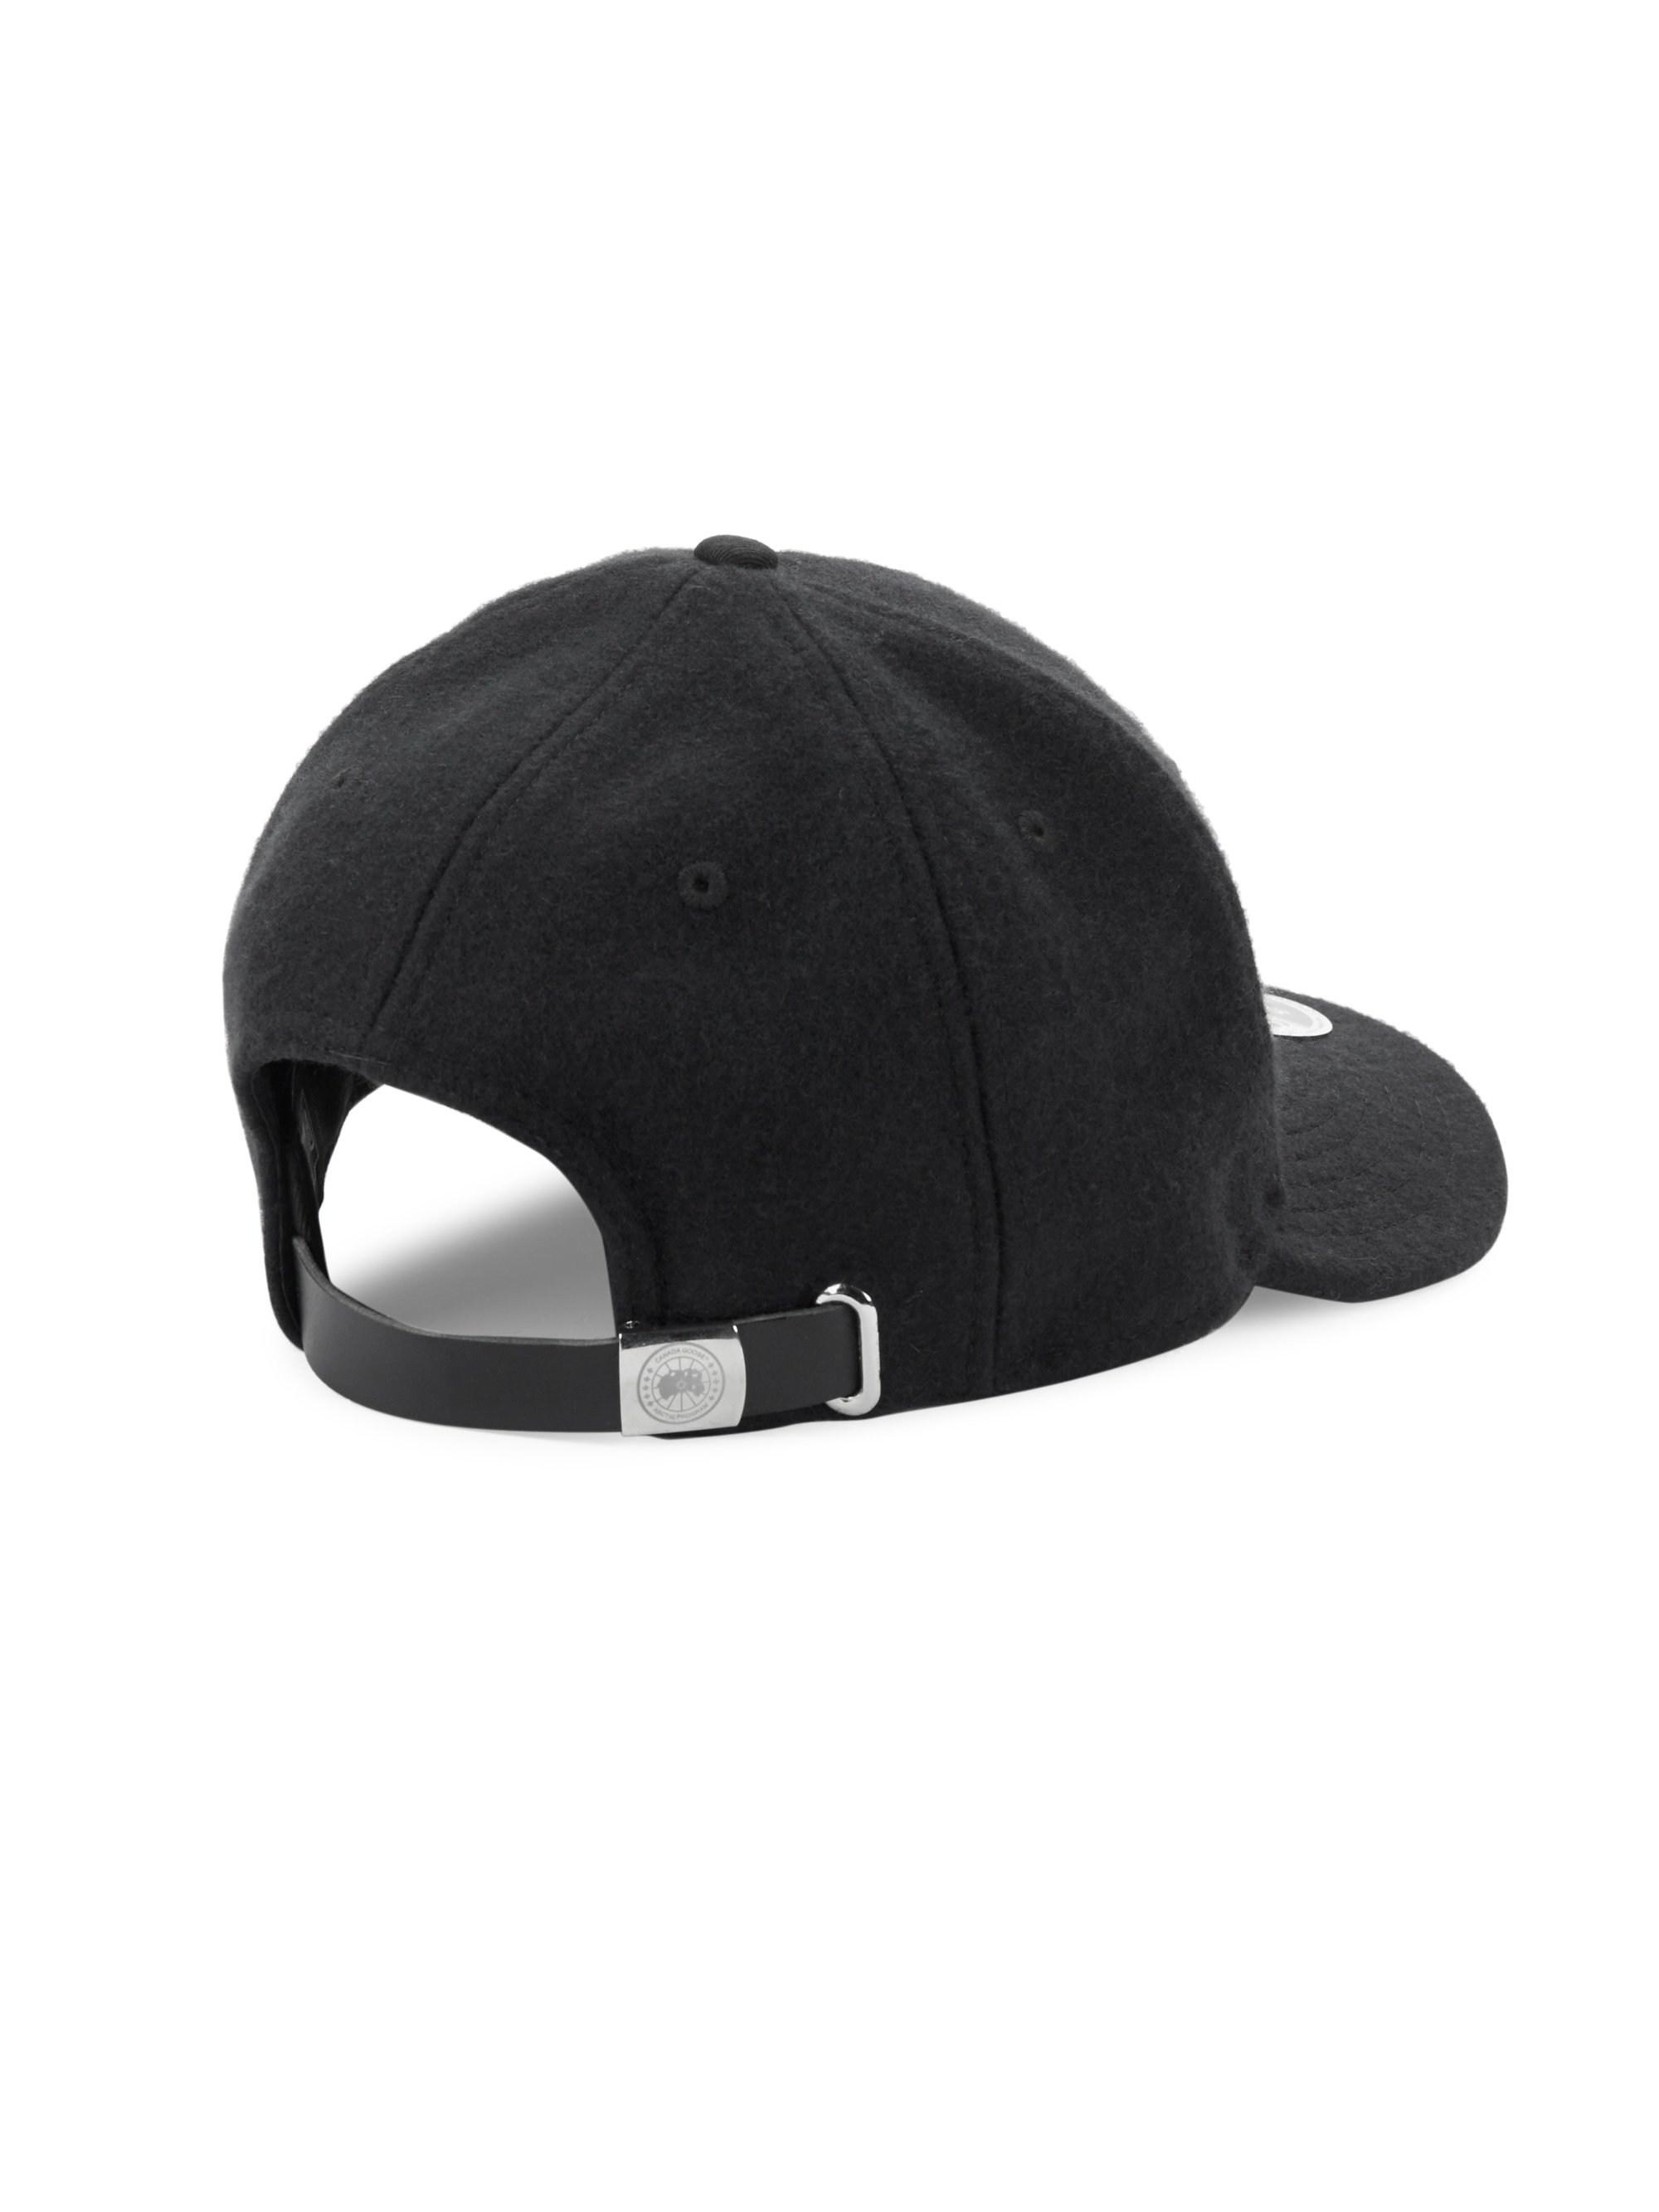 b01c6a29c4d Canada Goose Melton Wool Baseball Hat in Black for Men - Lyst